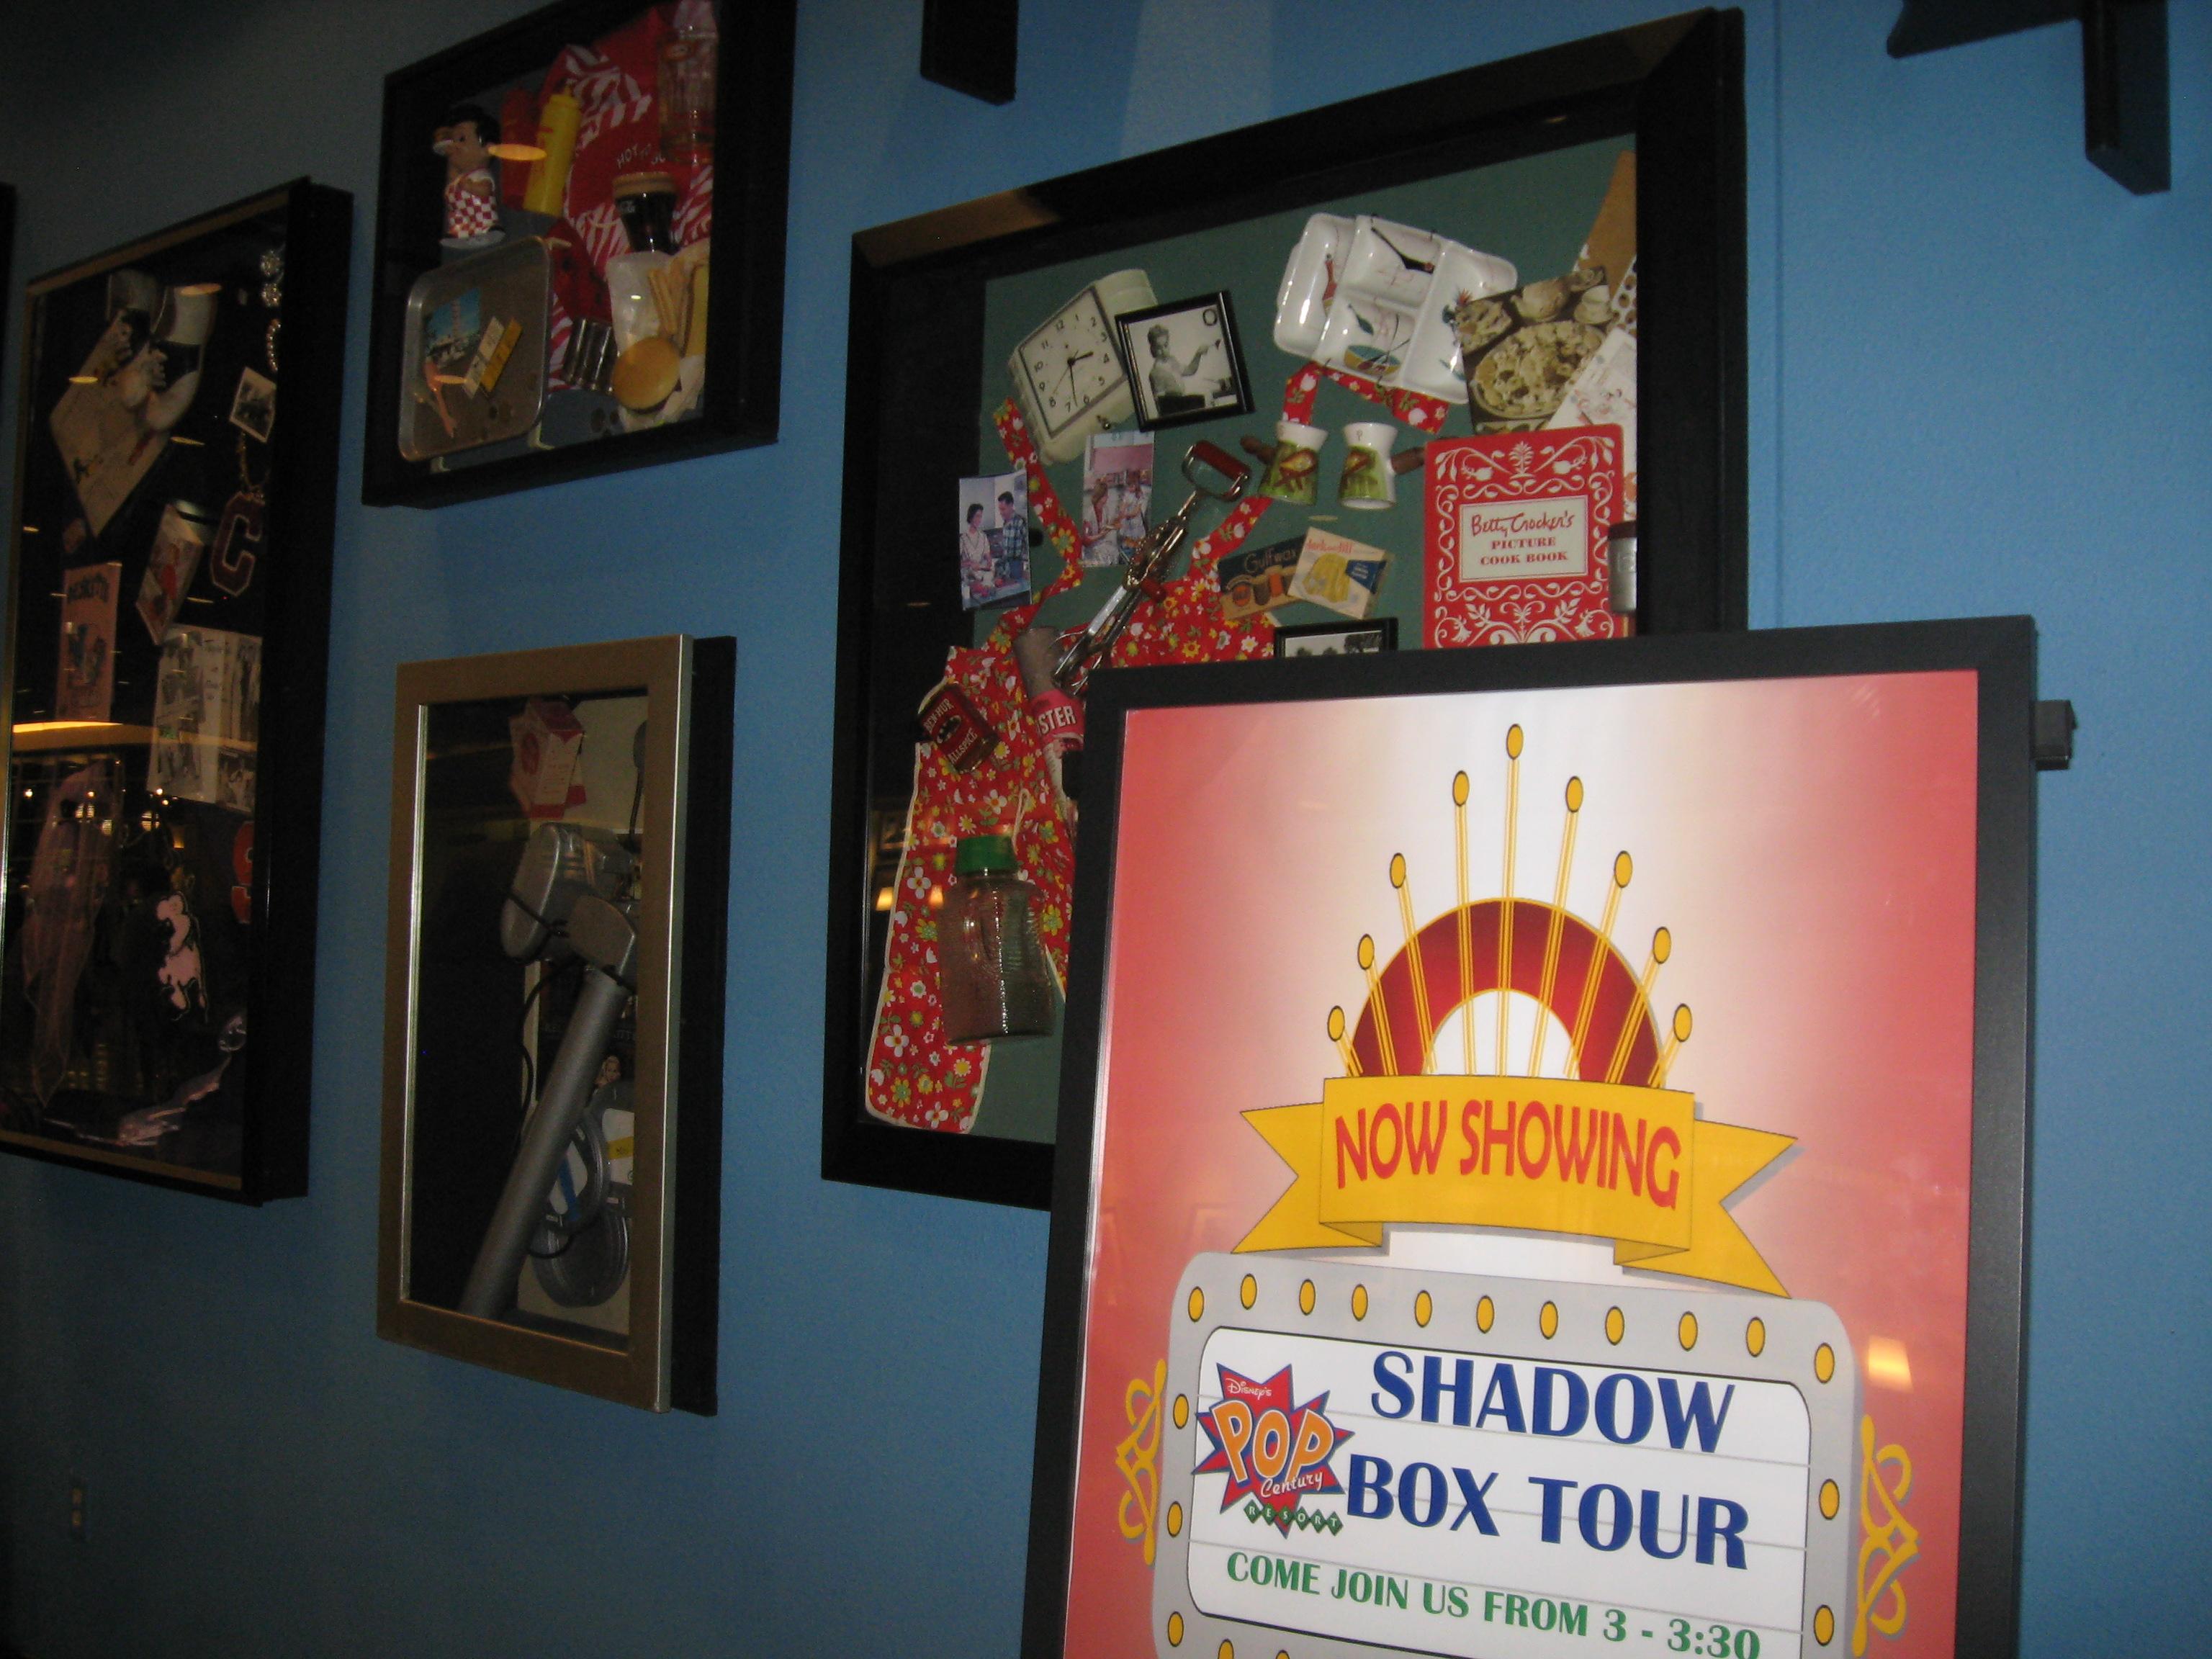 Shadow Box Tour Disney Vacation Education